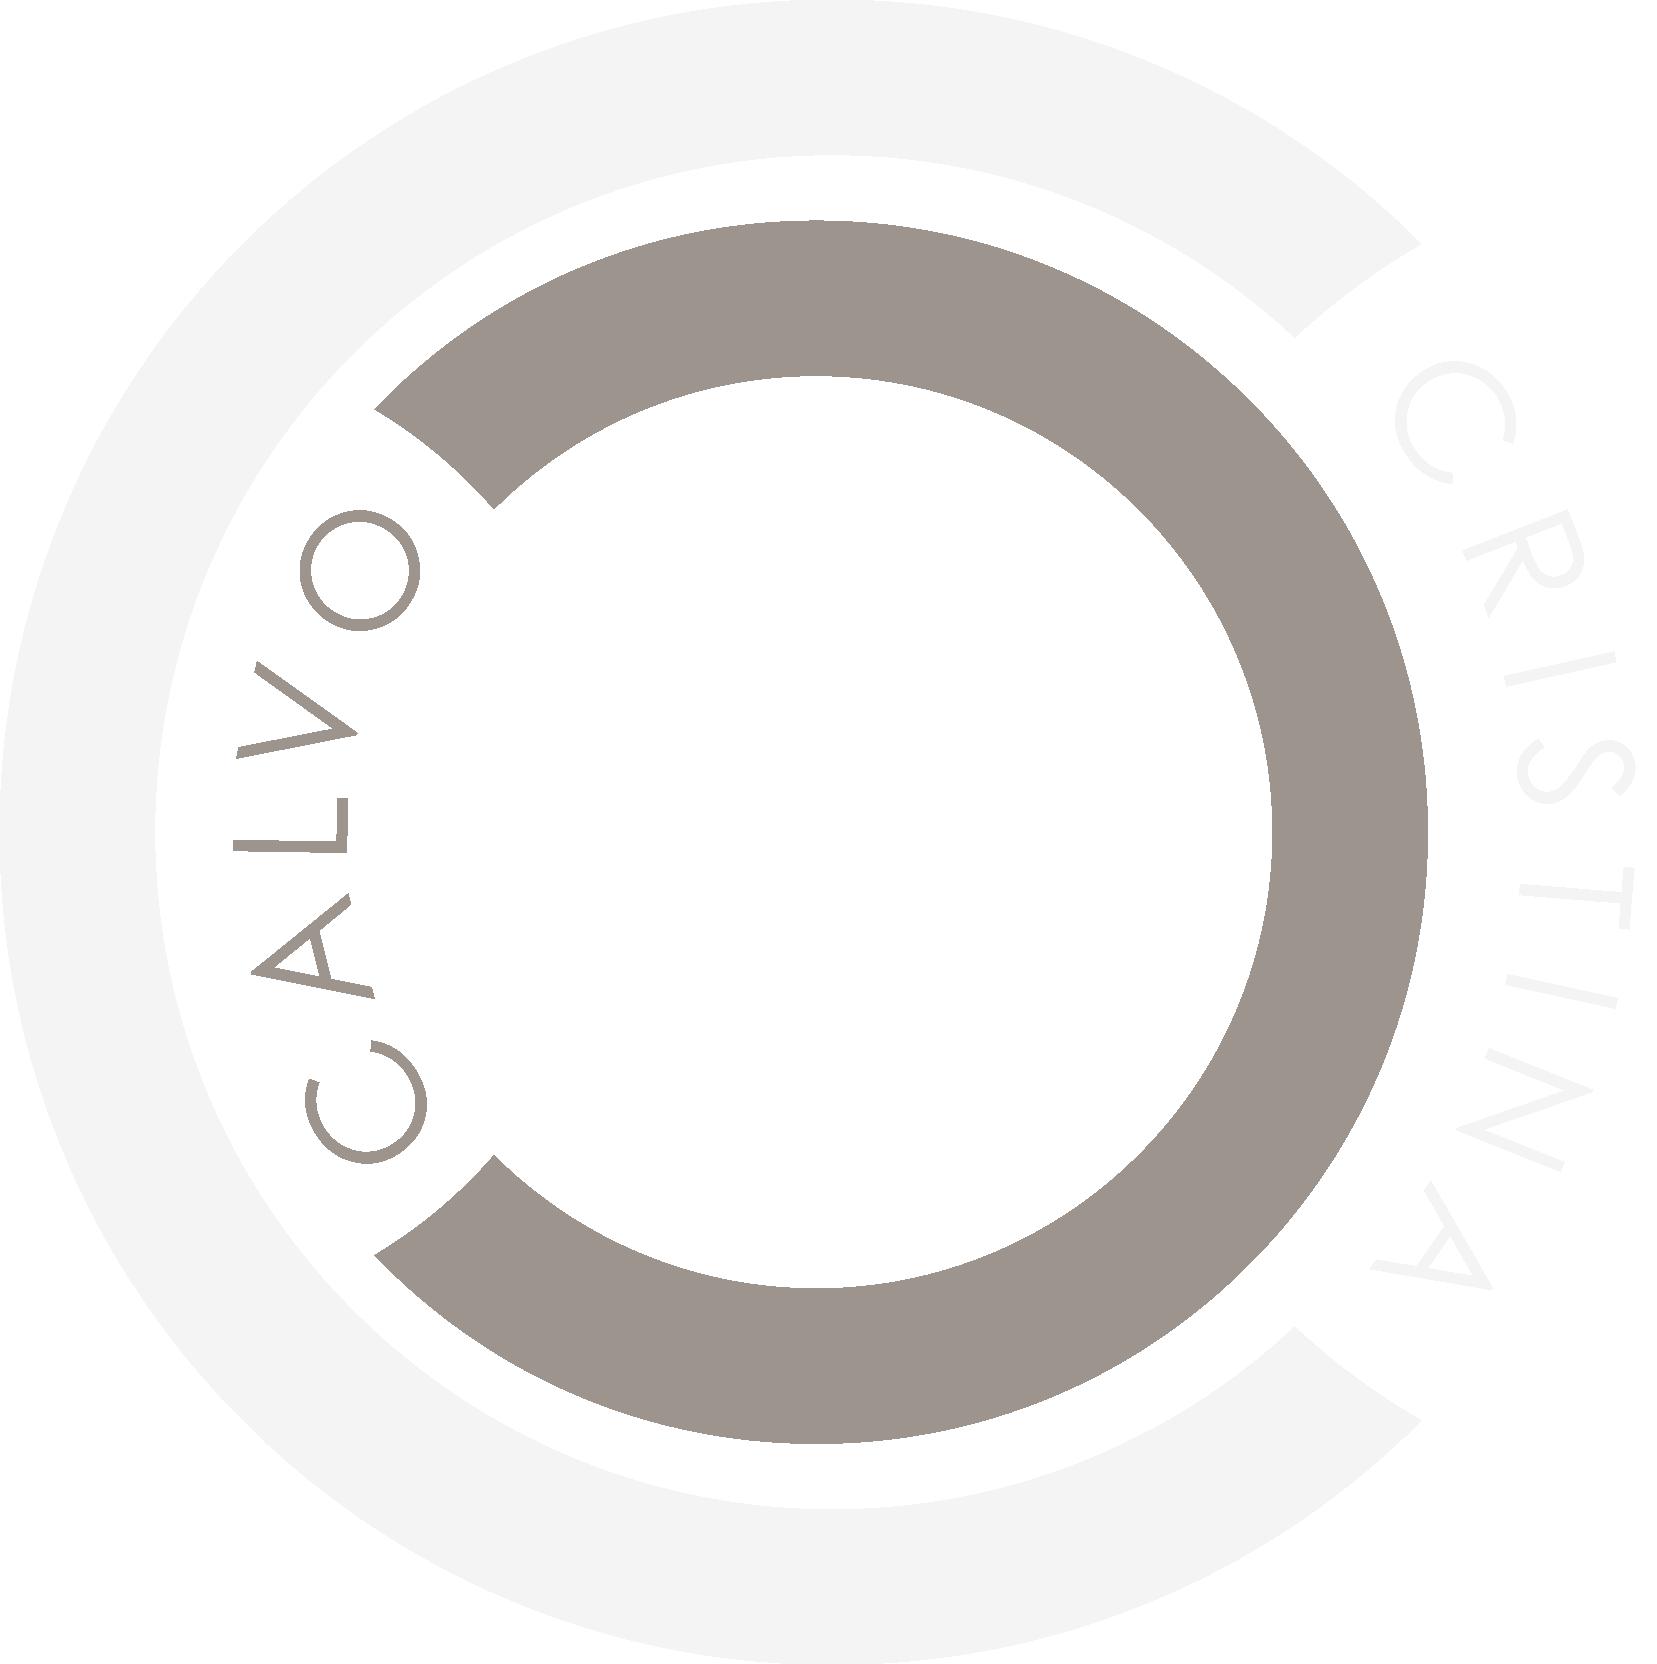 Cristina_Calvo_logo